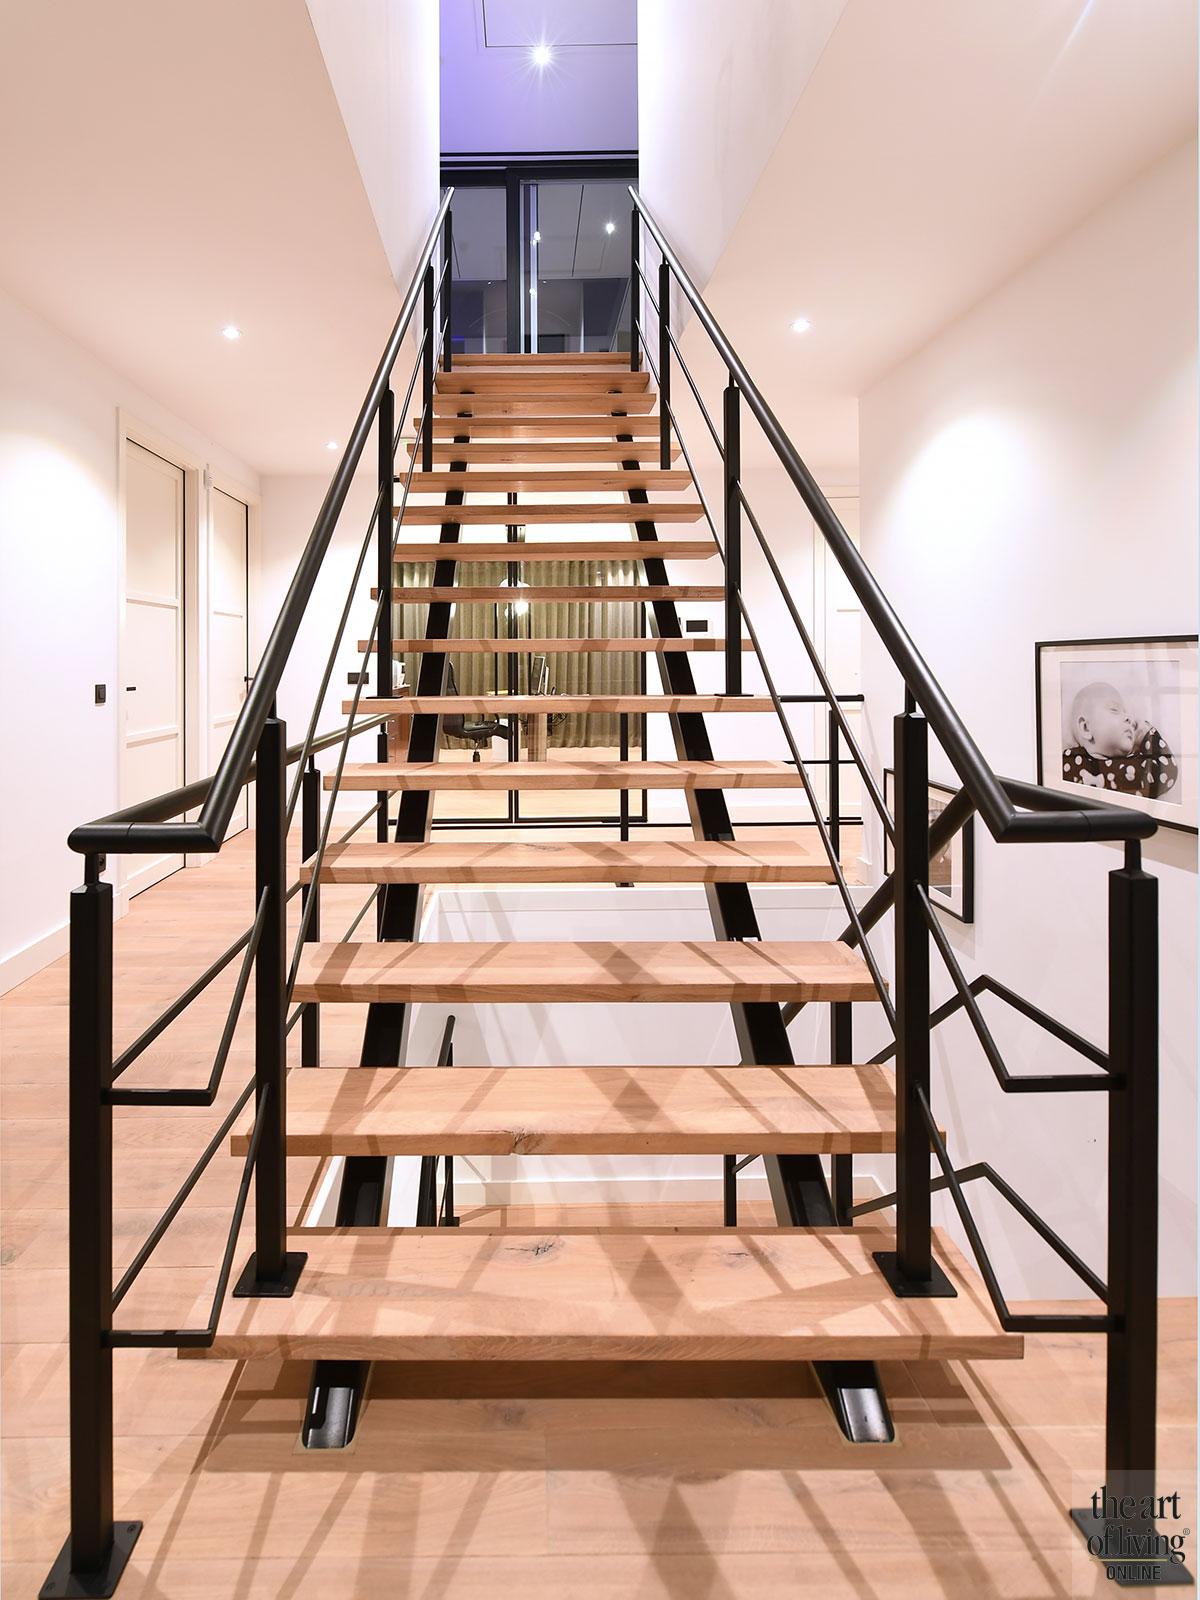 bijzondere trappen | Thomas de Gier, the art of living